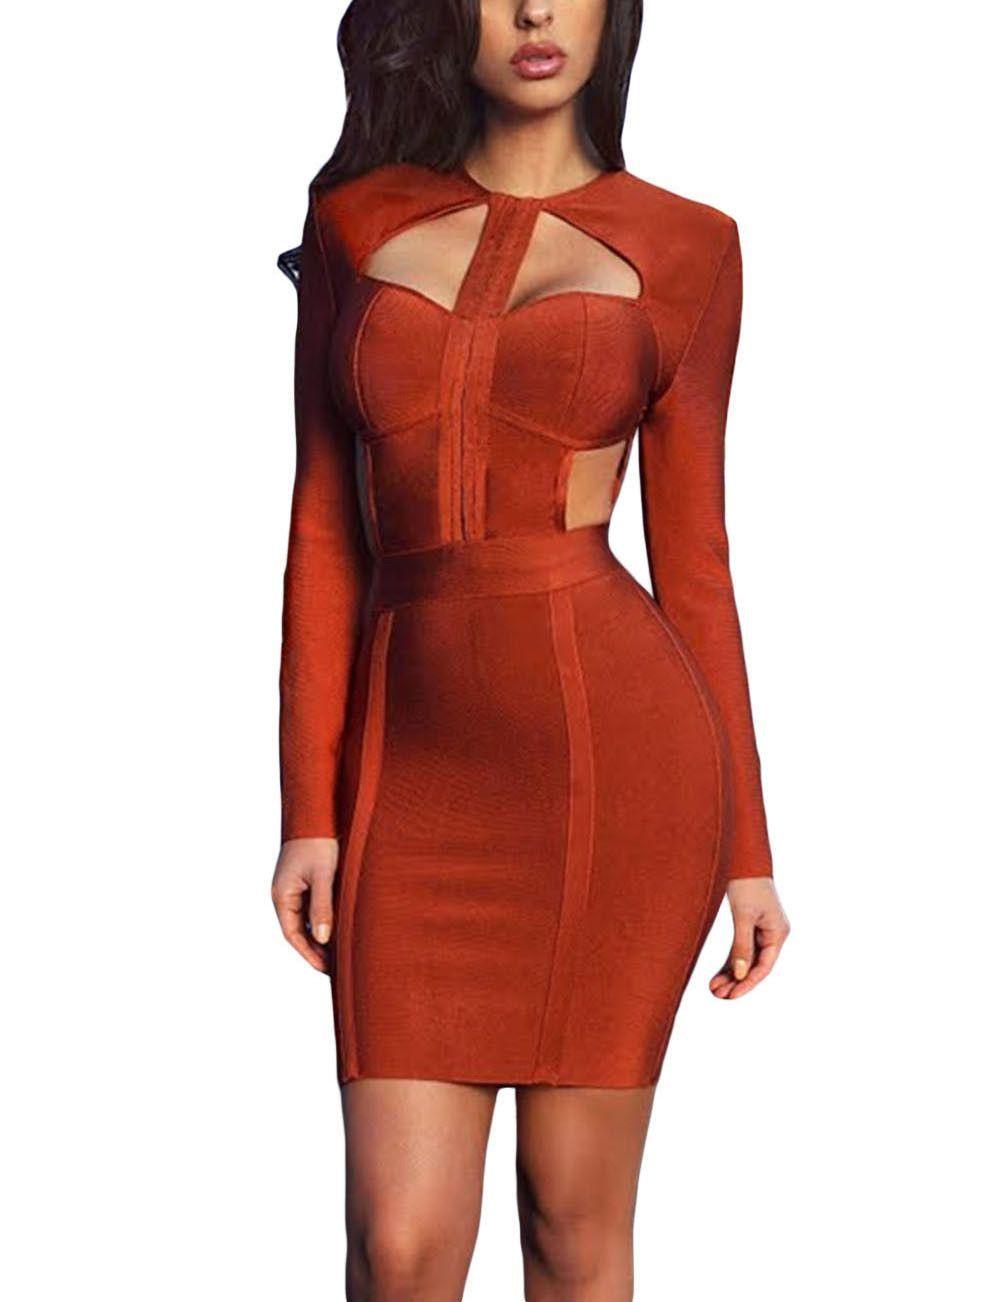 Seventhstitch Com Is For Sale Brandbucket Bodycon Dress Bandage Dress Womens Dresses [ 1302 x 1001 Pixel ]